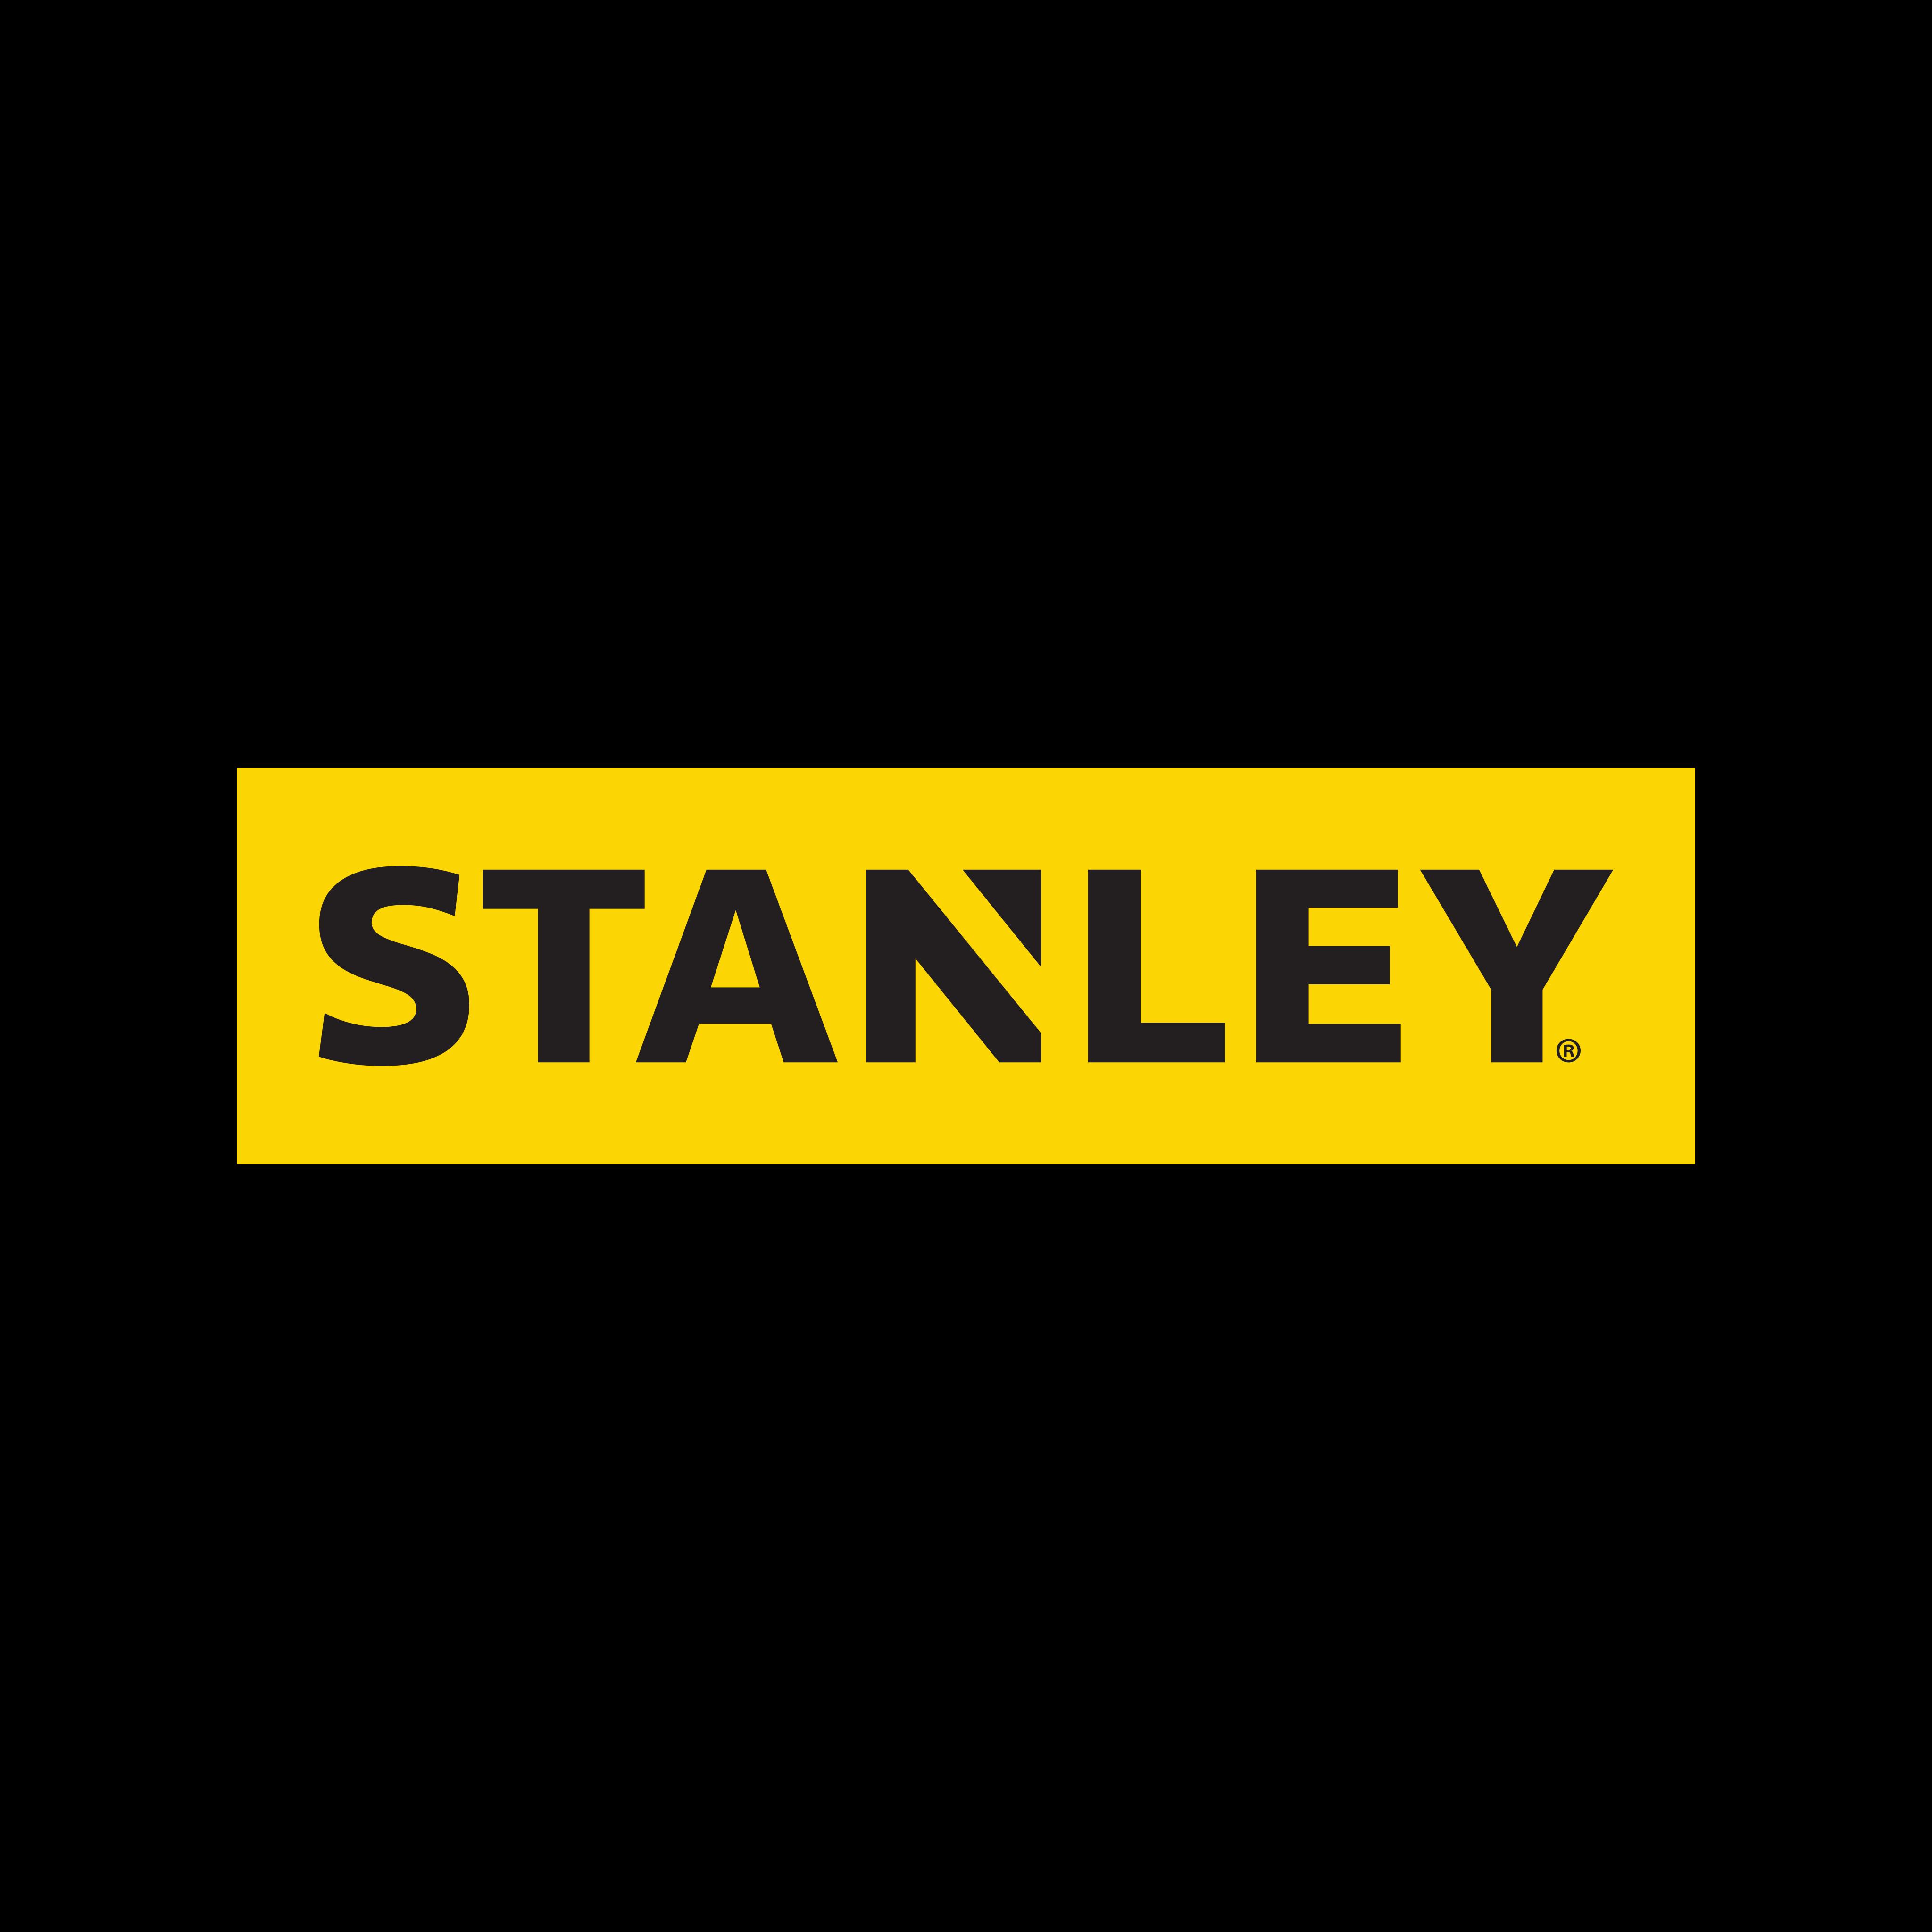 stanley logo 0 - Stanley Logo